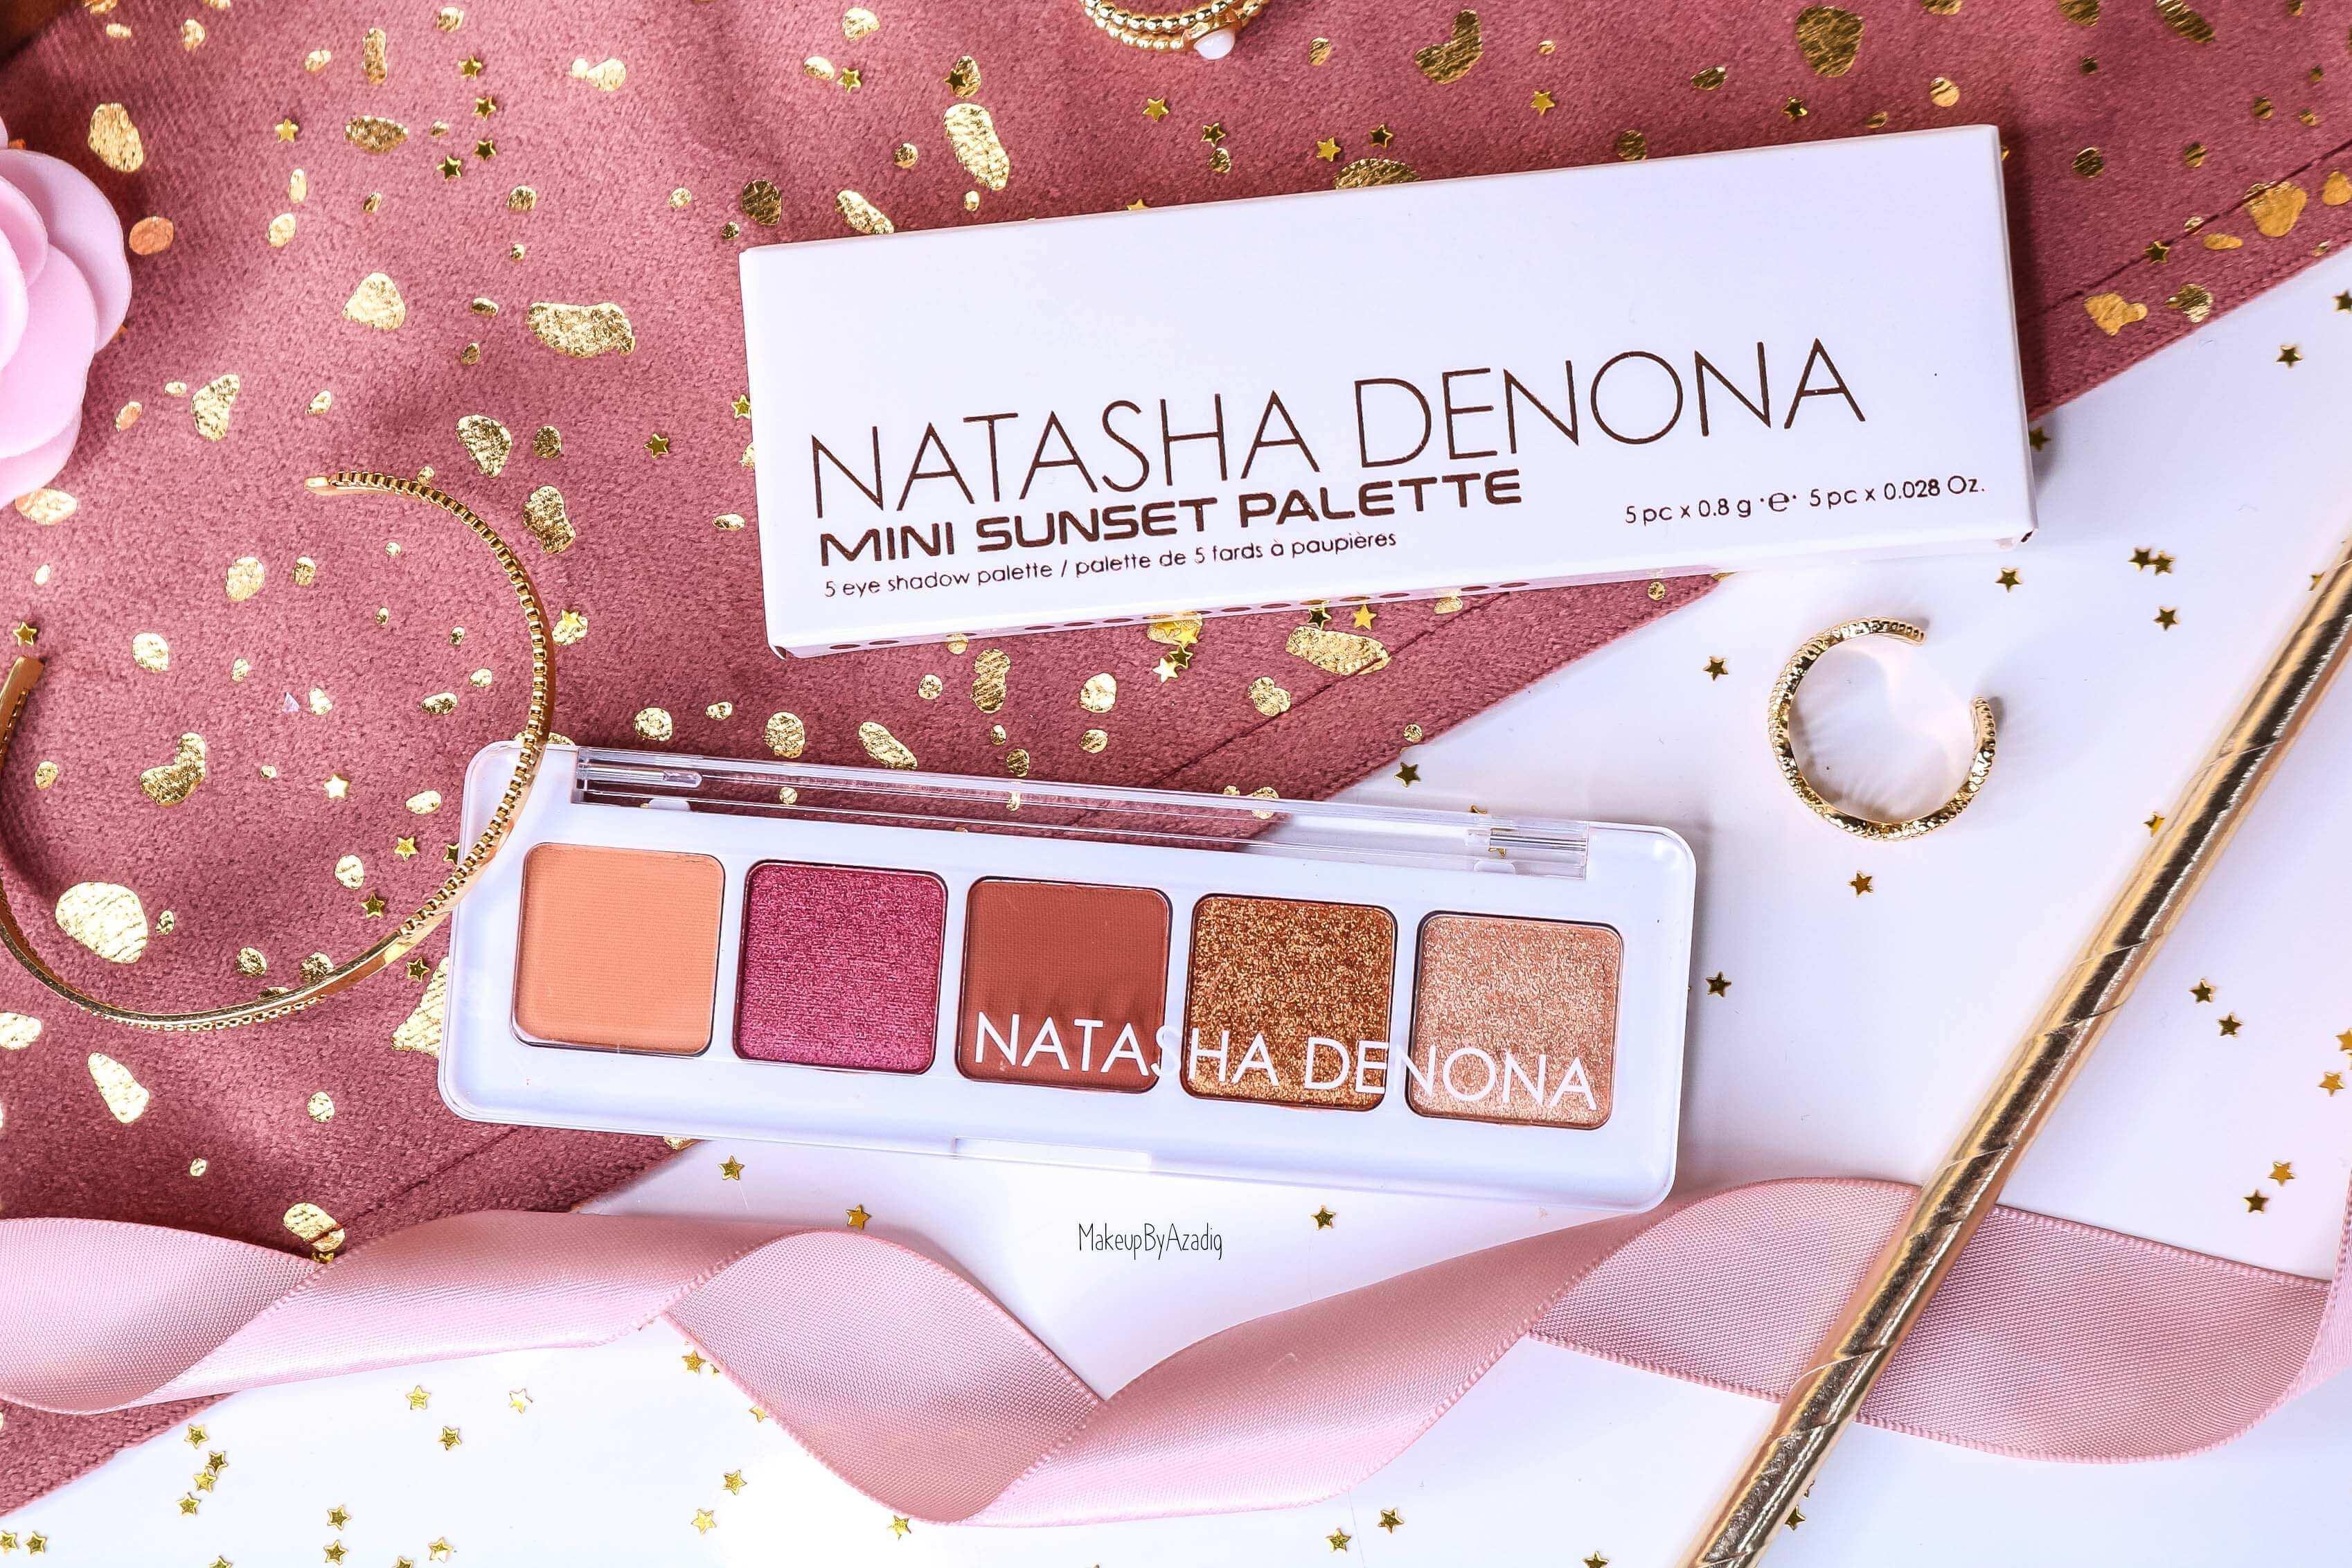 revue-palette-mini-sunset-natasha-denona-sephora-france-avis-prix-swatch-gold-champagne-burgundy-makeupbyazadig-eyeshadow-review